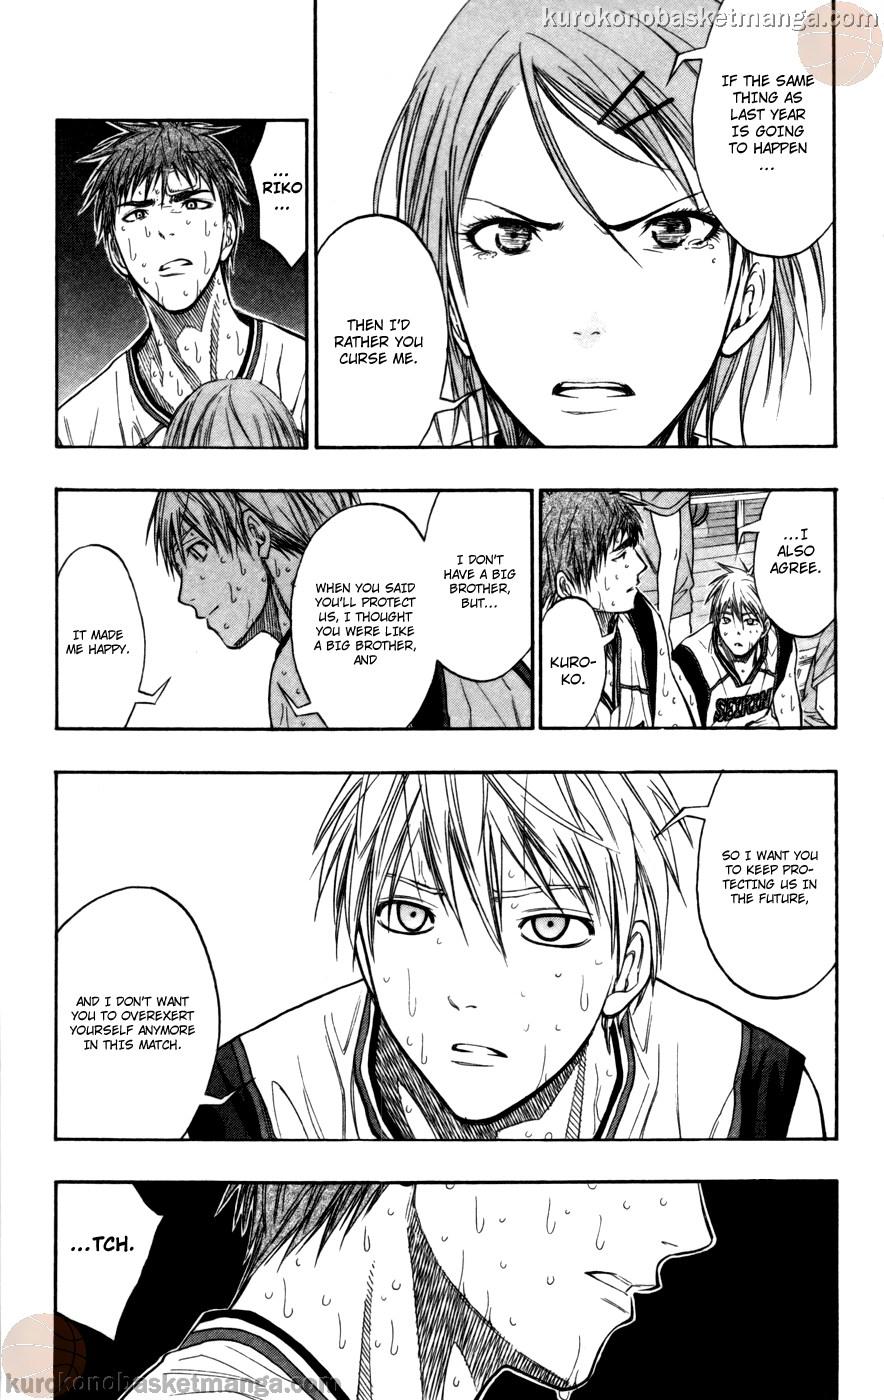 Kuroko no Basket Manga Chapter 105 - Image 19